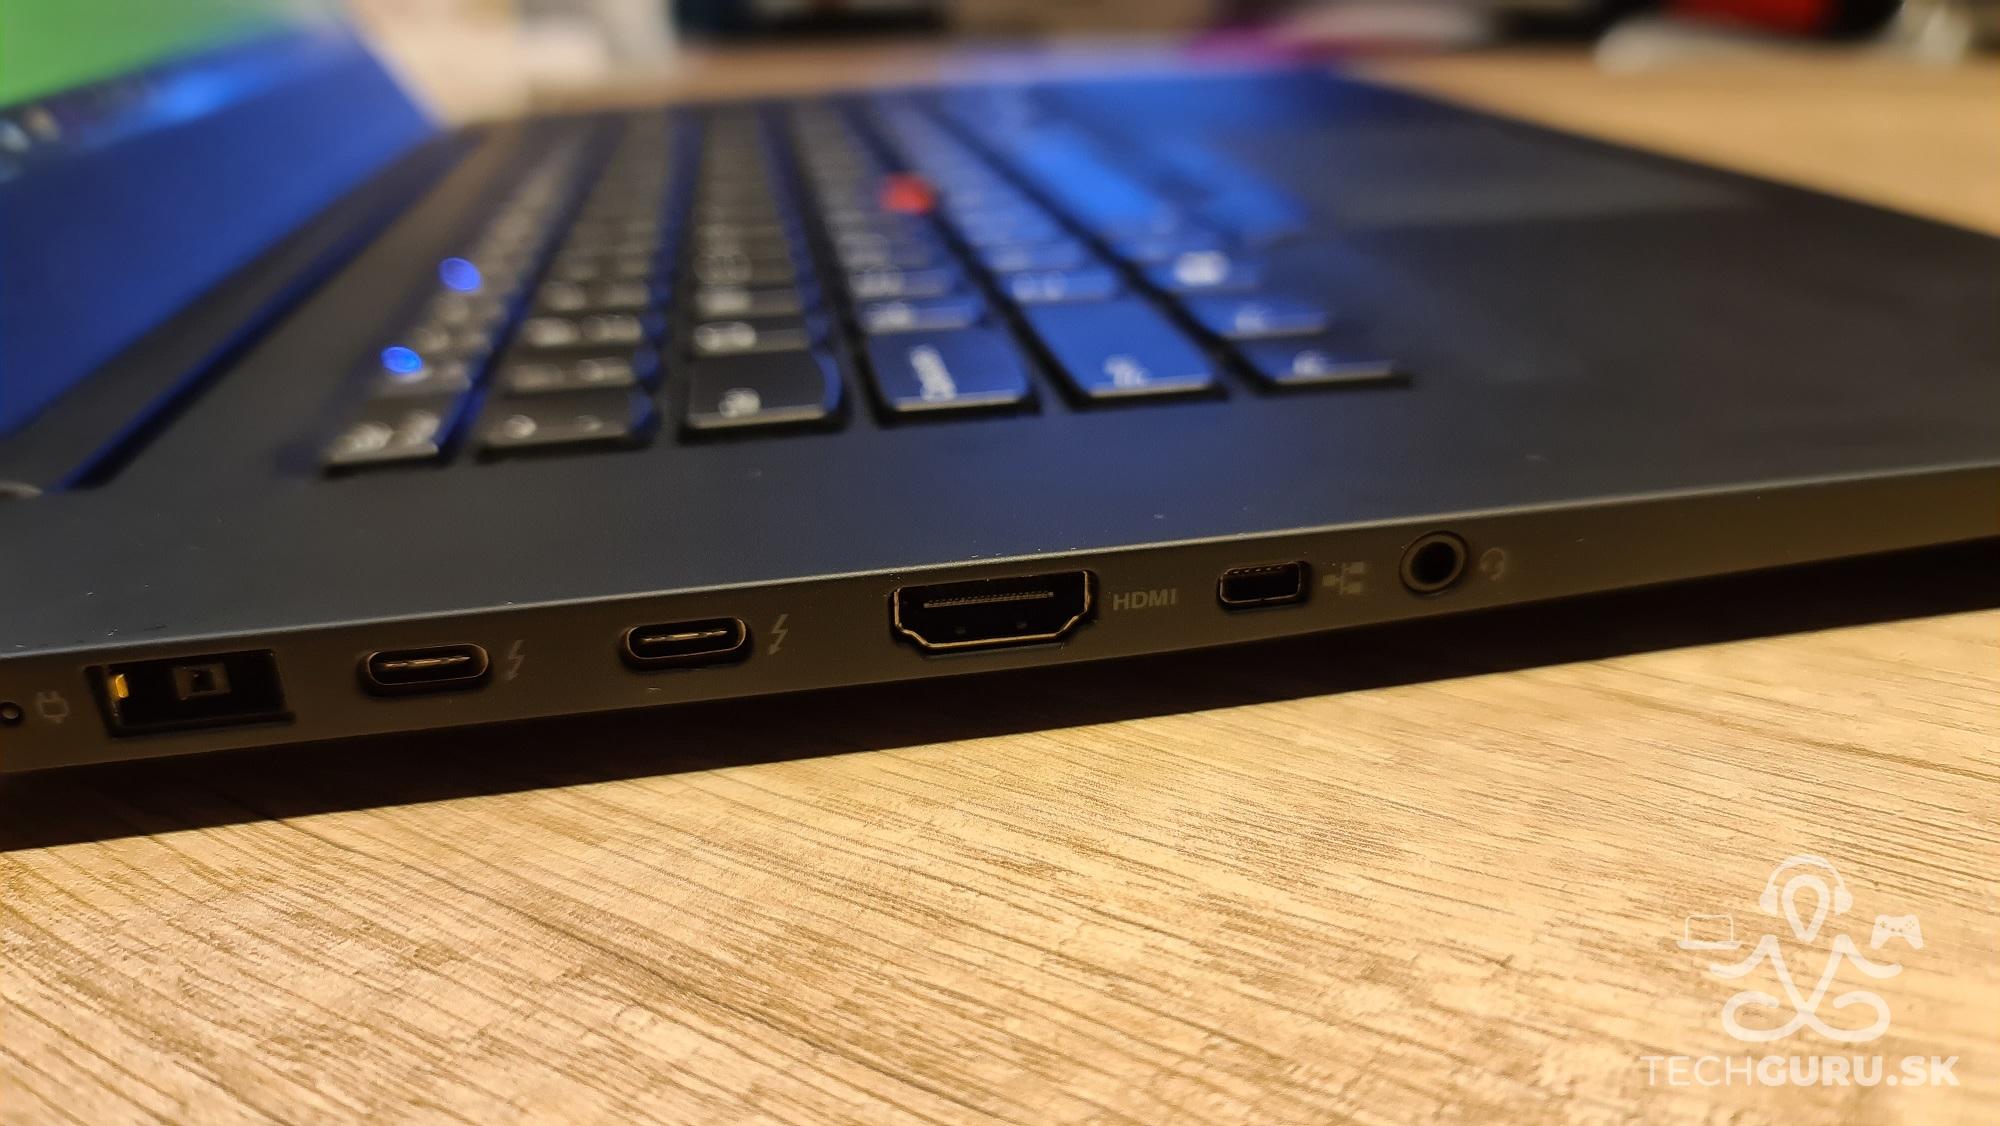 Lenovo ThinkPad X1 Extreme Gen 2 recenzia 05